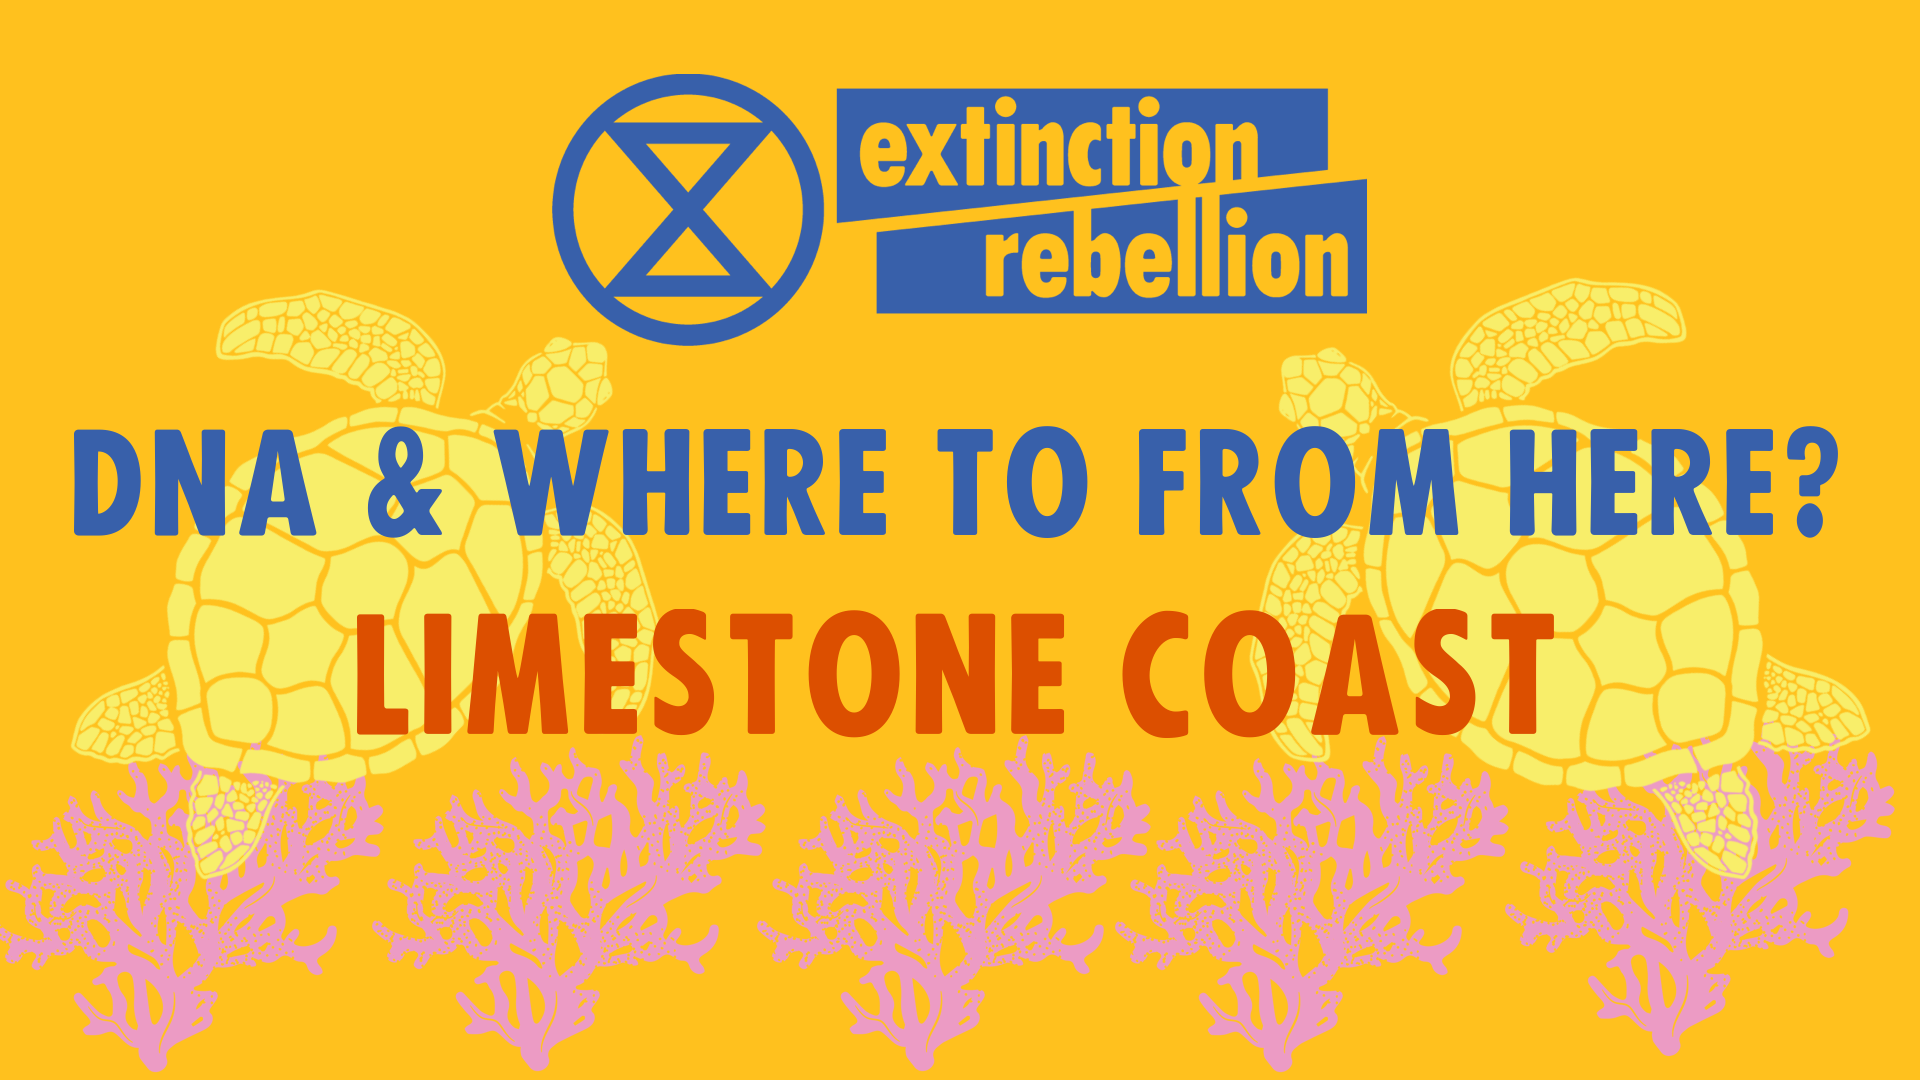 Dna_limestone_coast